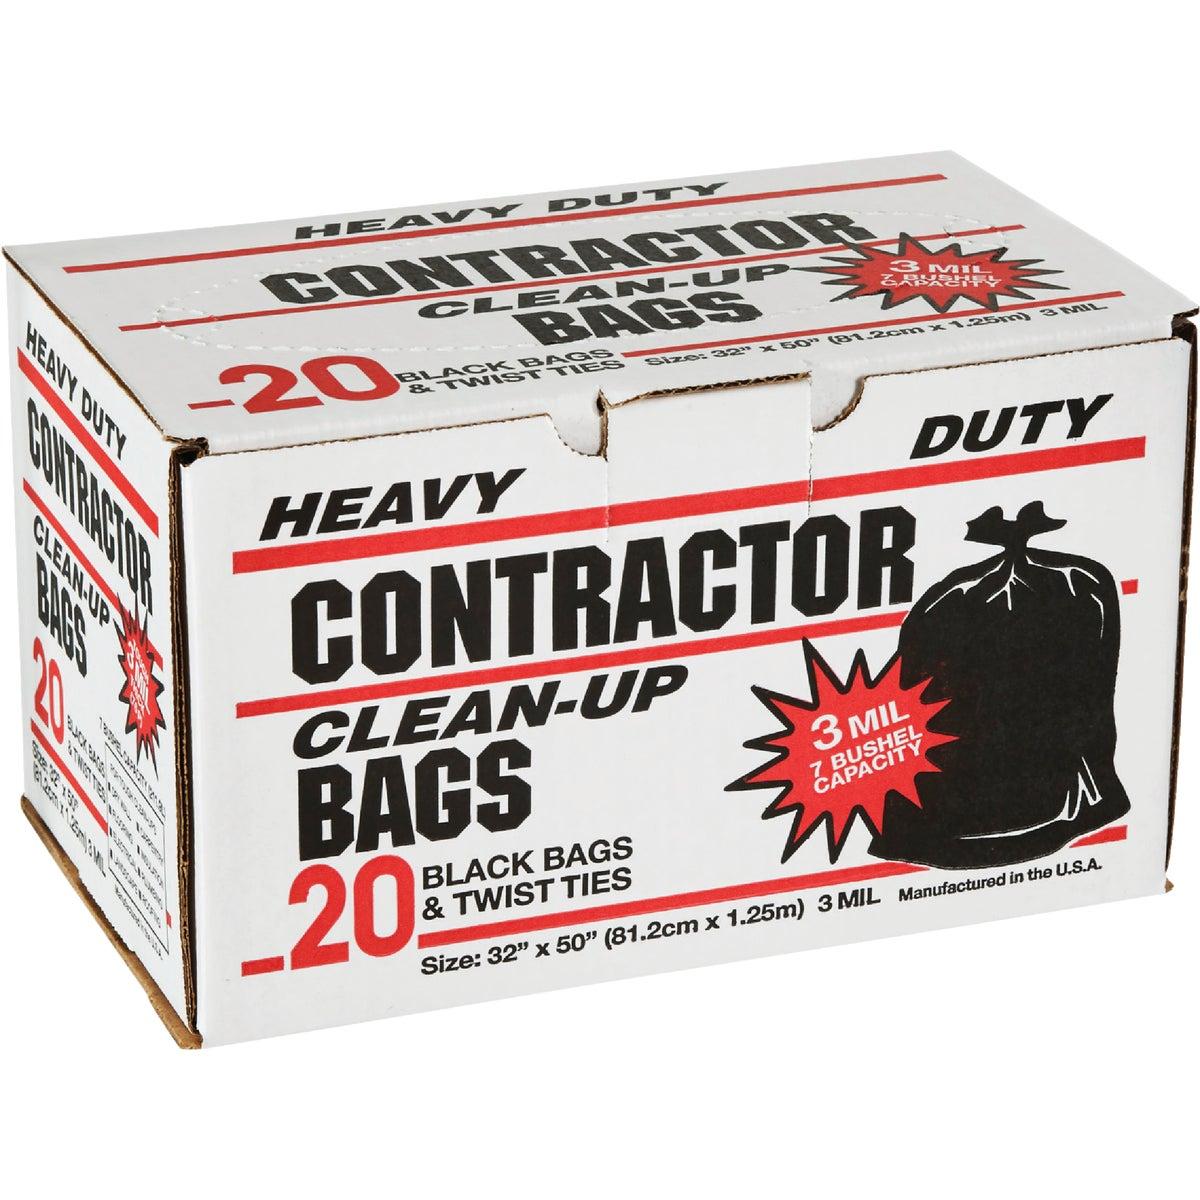 20CT CONTRACTOR BAGS